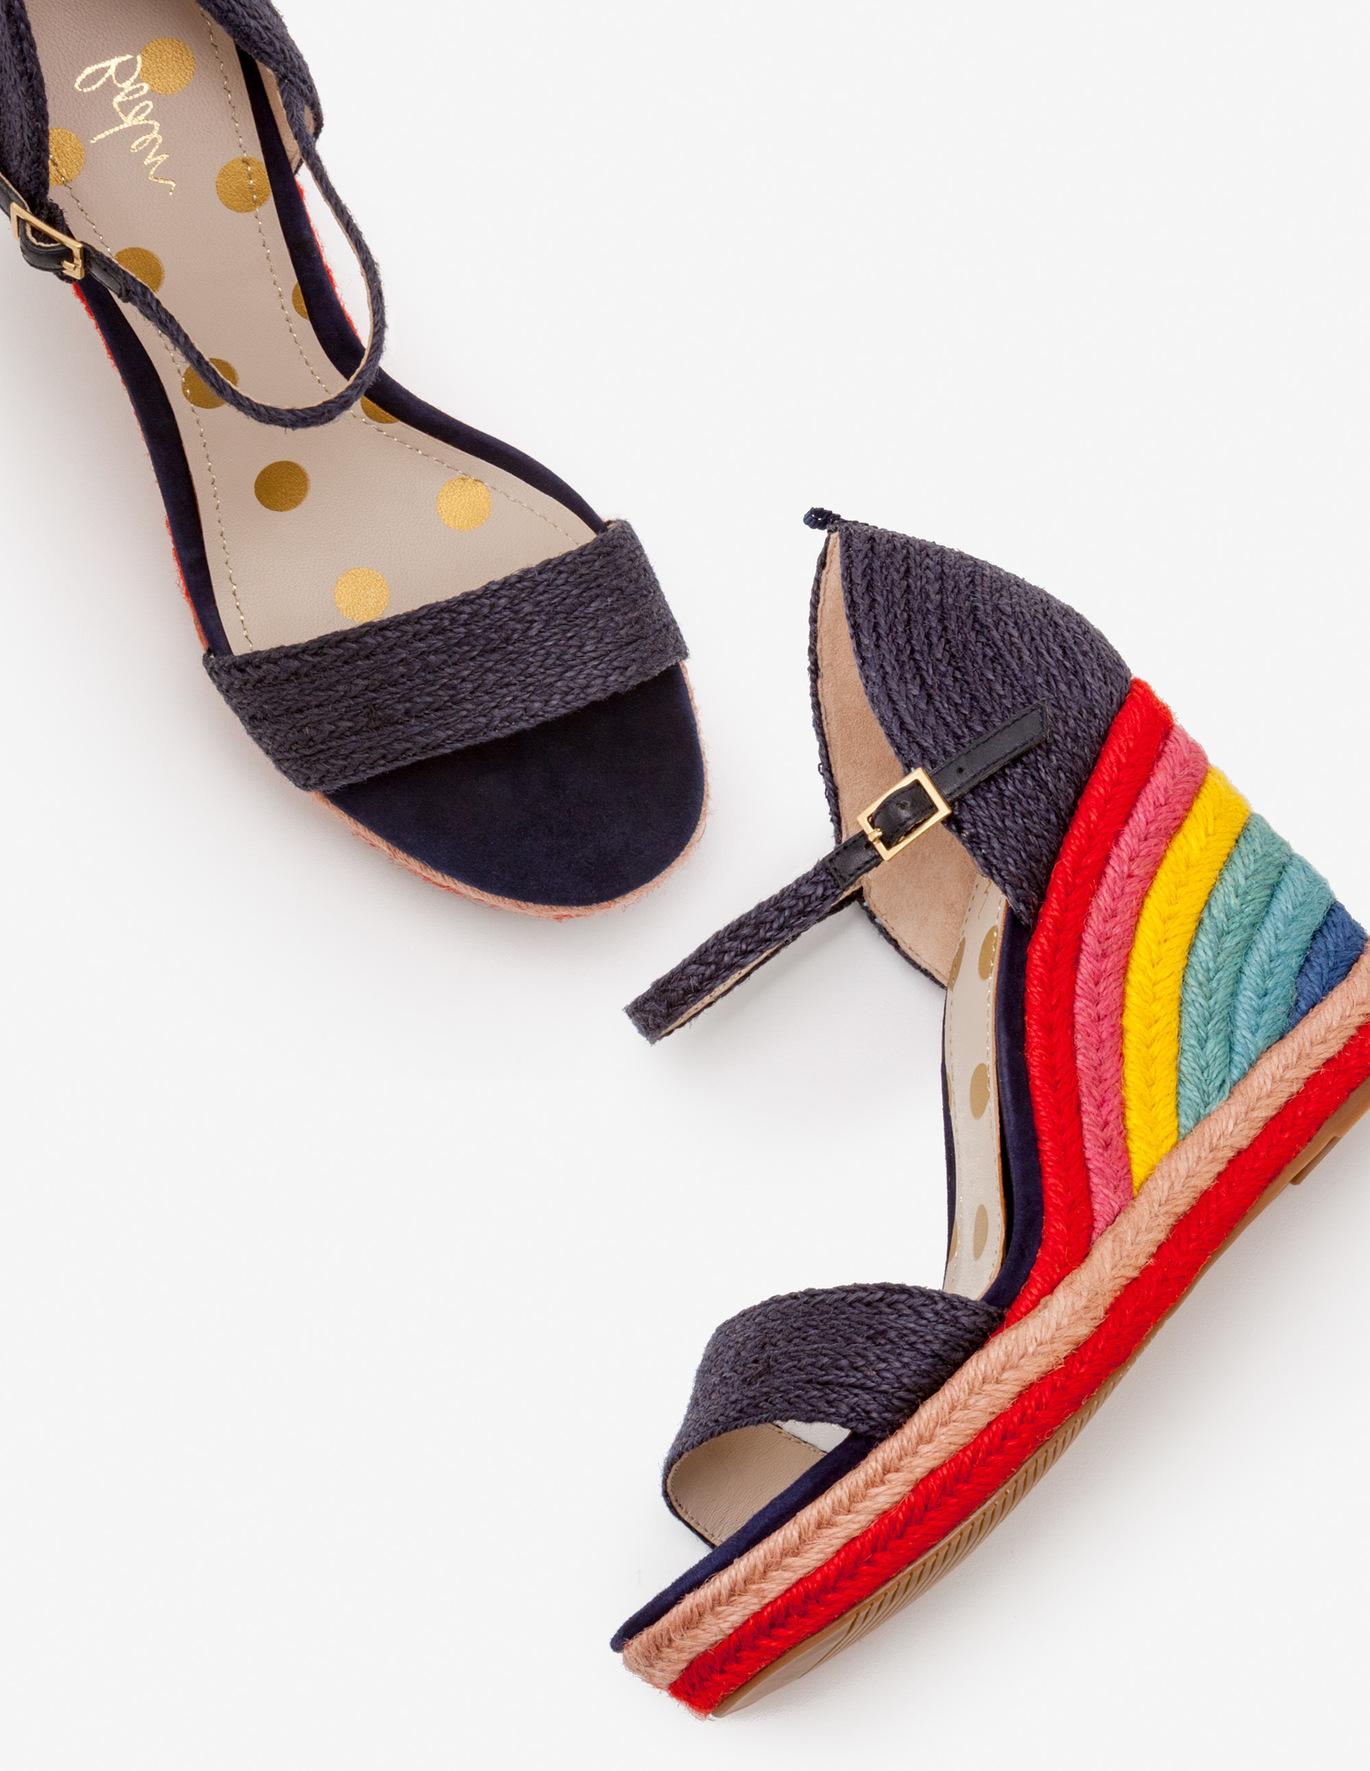 Rainbow espadrilles; image via Boden